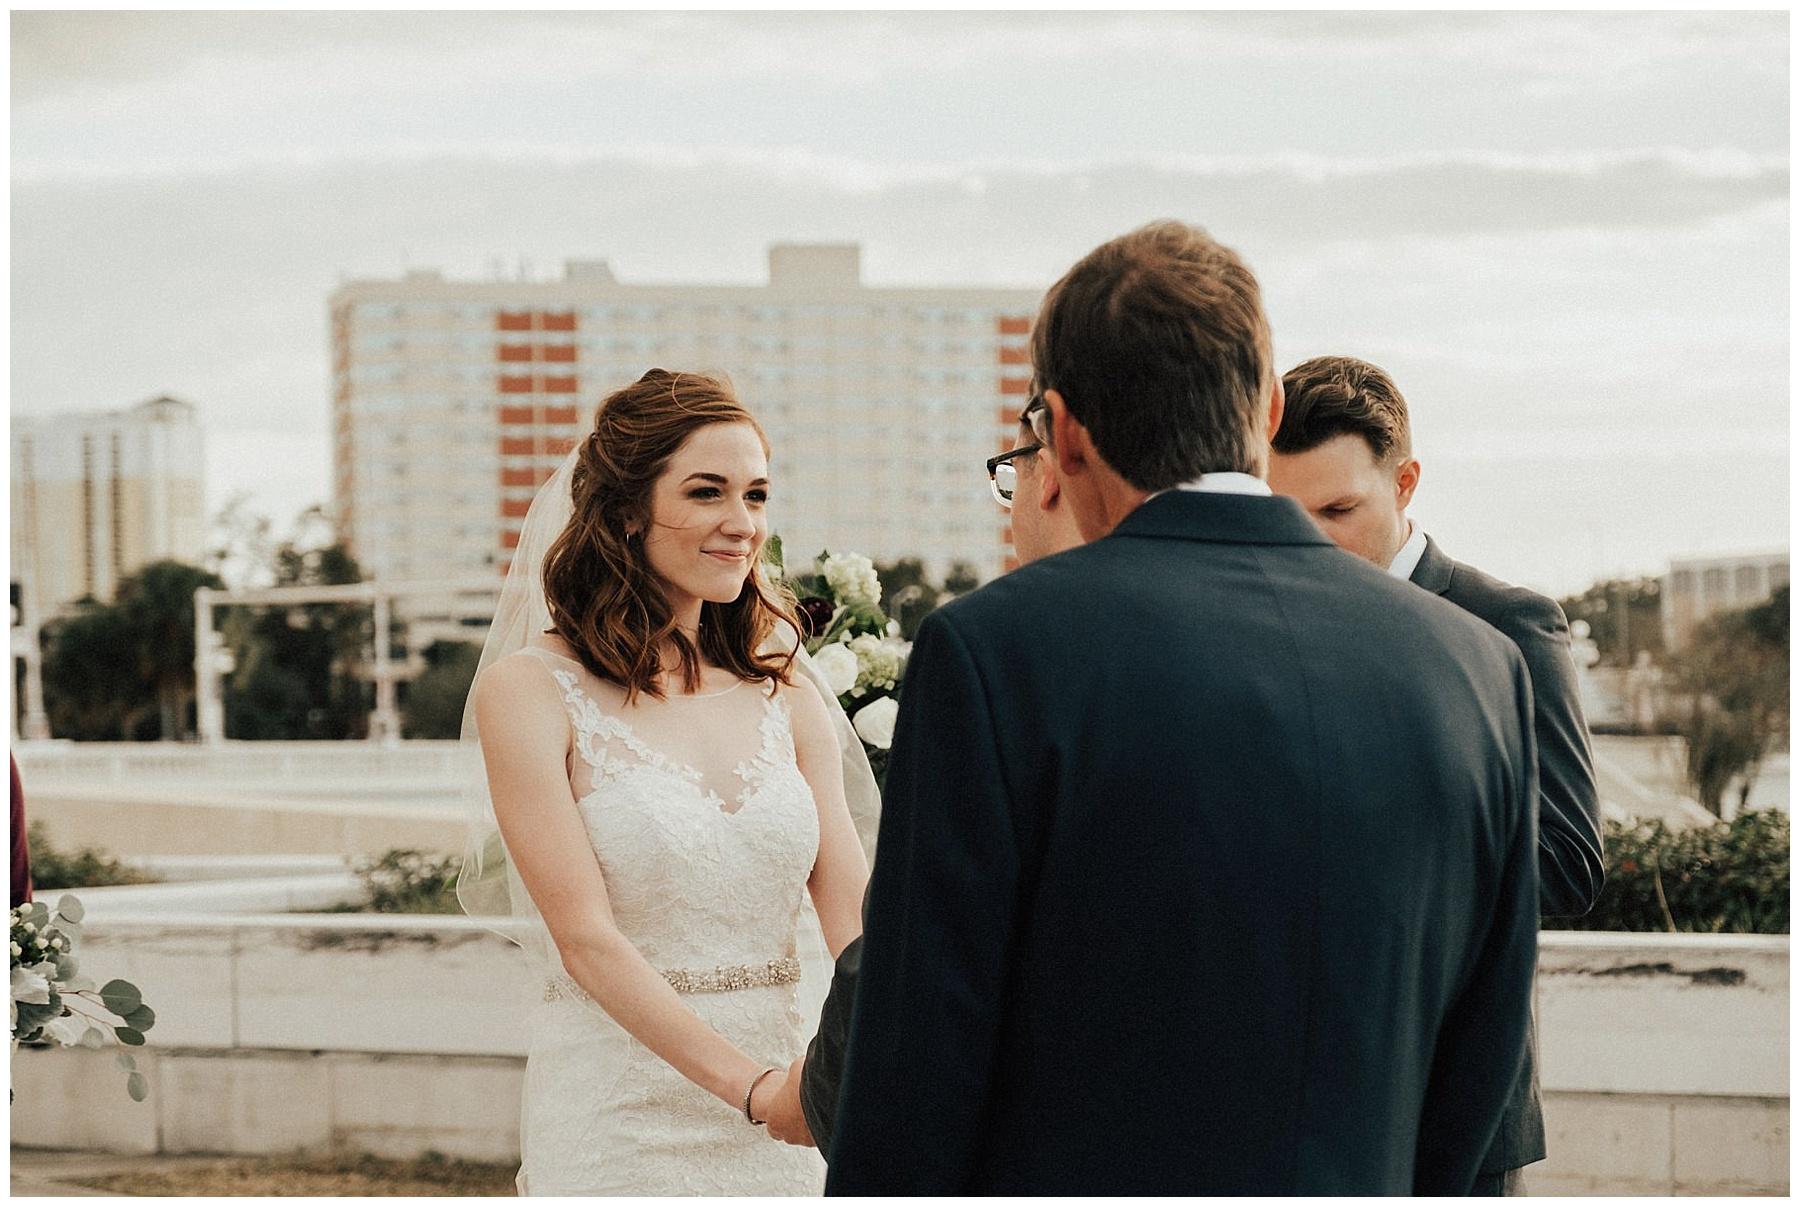 Kylie Garden Wedding Tampa Wedding Photographer-69.jpg